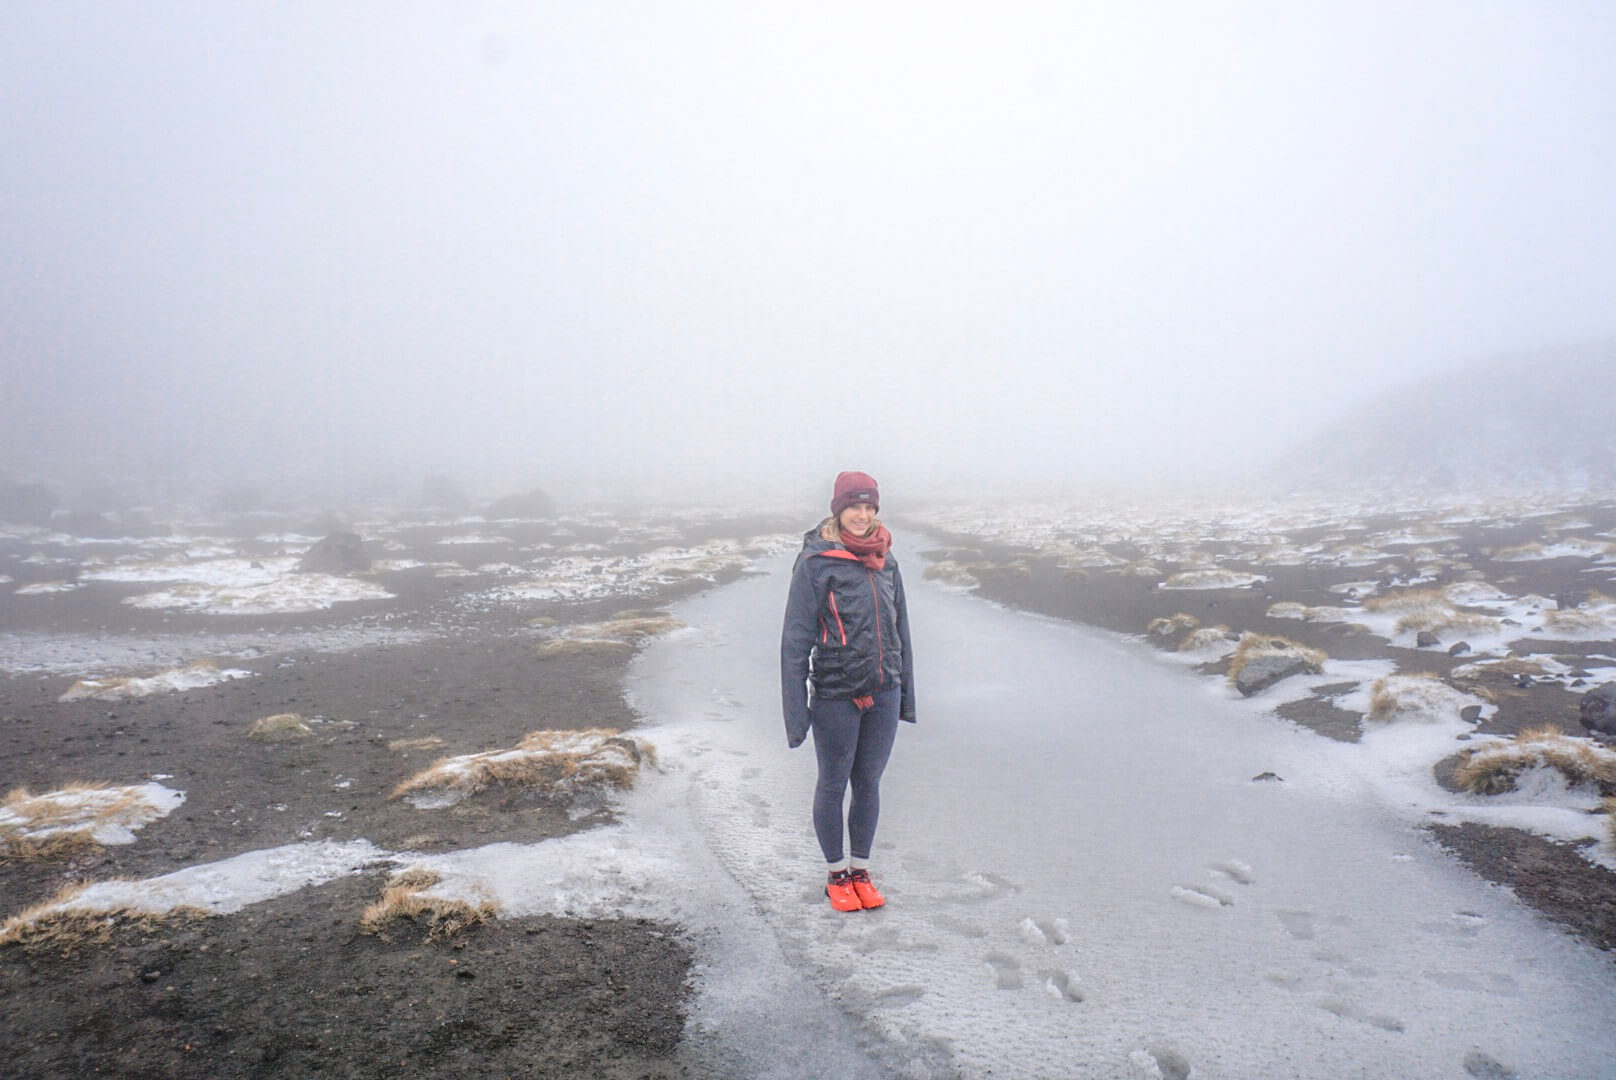 automne sentier gelé Tongariro alpine crossing randonnée